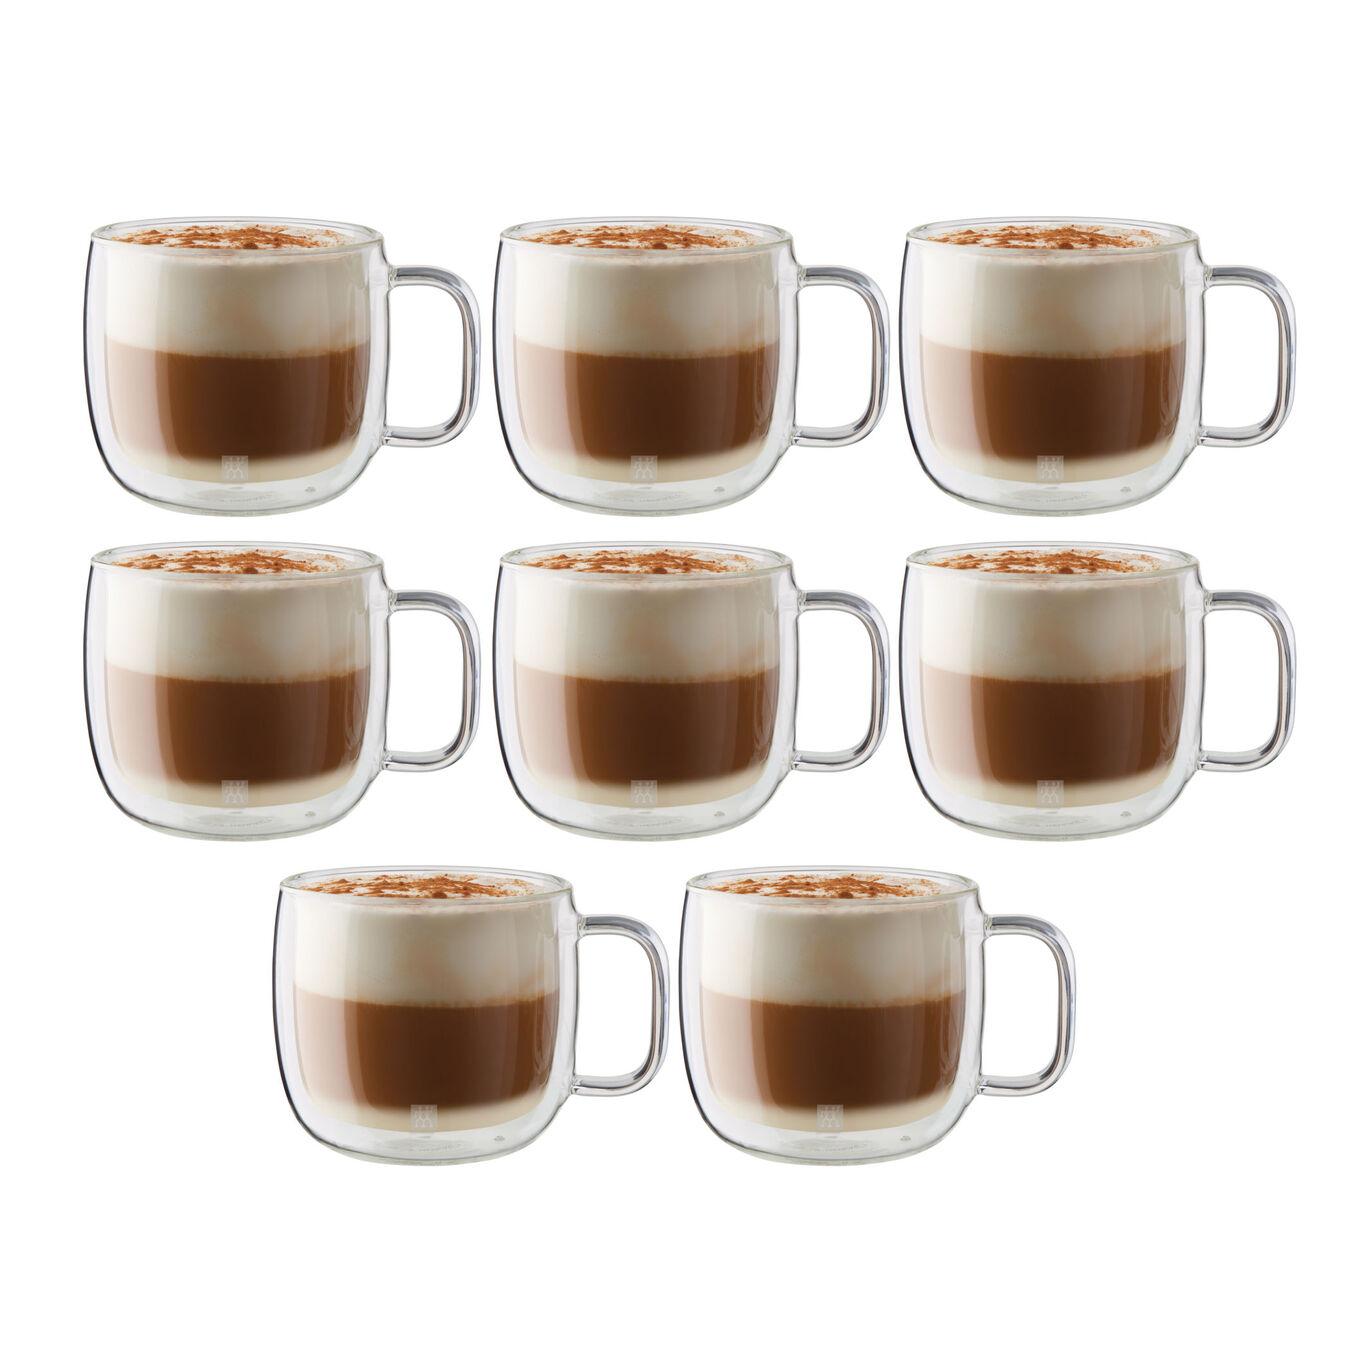 8 Piece Cappuccino Mug Set - Value Pack,,large 2